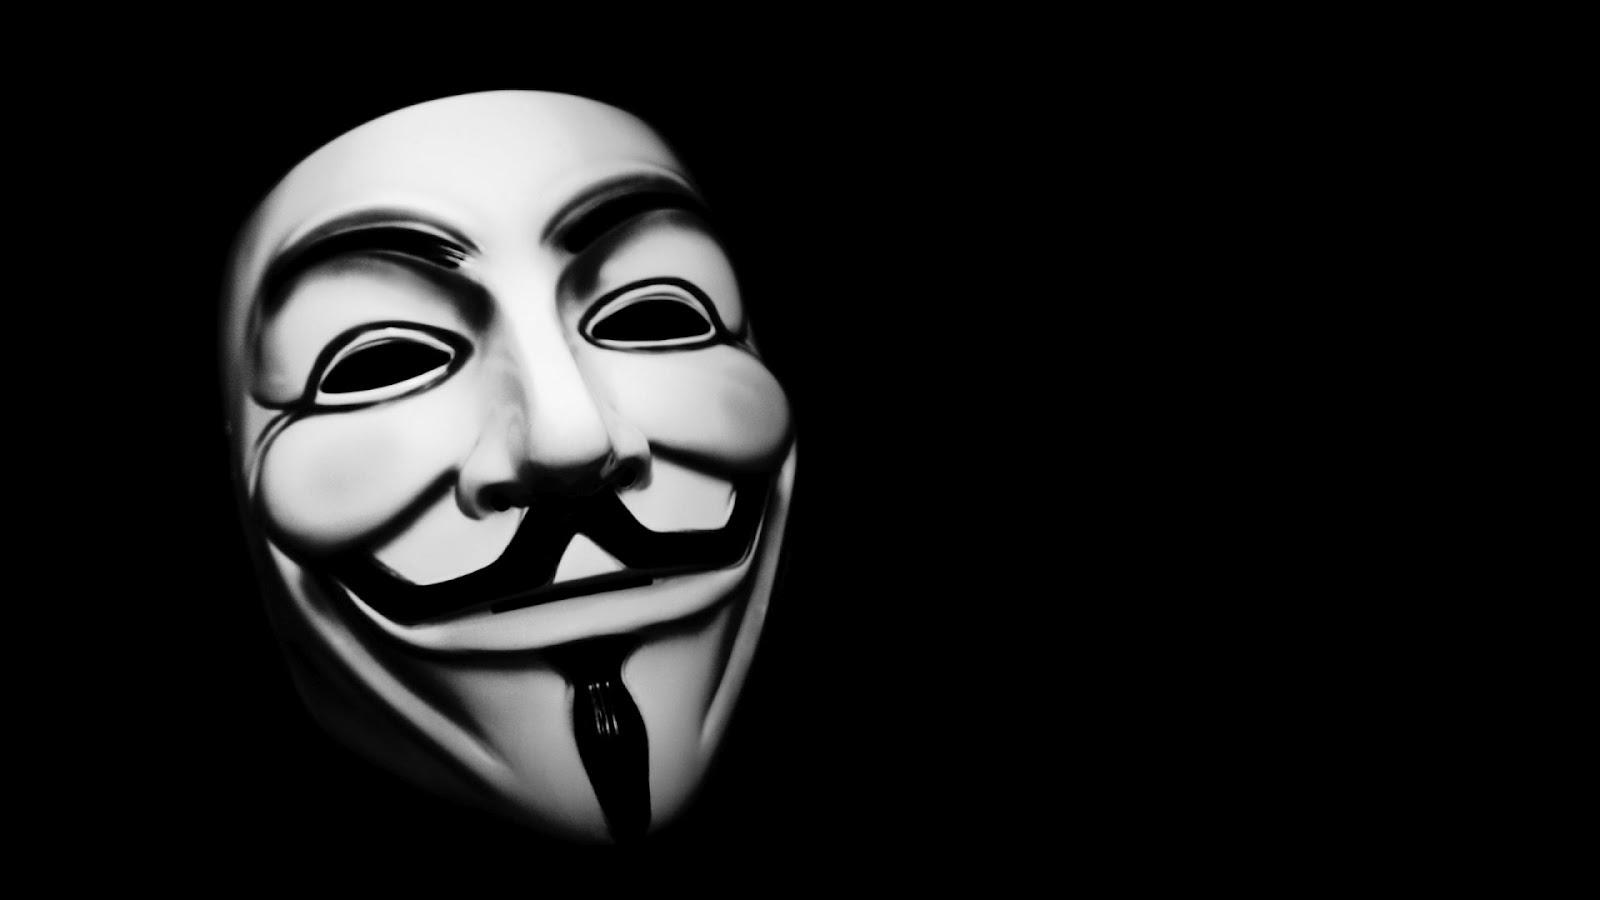 http://4.bp.blogspot.com/-eYjOj-GOBbw/UGhiL6gPb3I/AAAAAAAAByw/LxoC6Oky5ds/s1600/anonymous.jpg